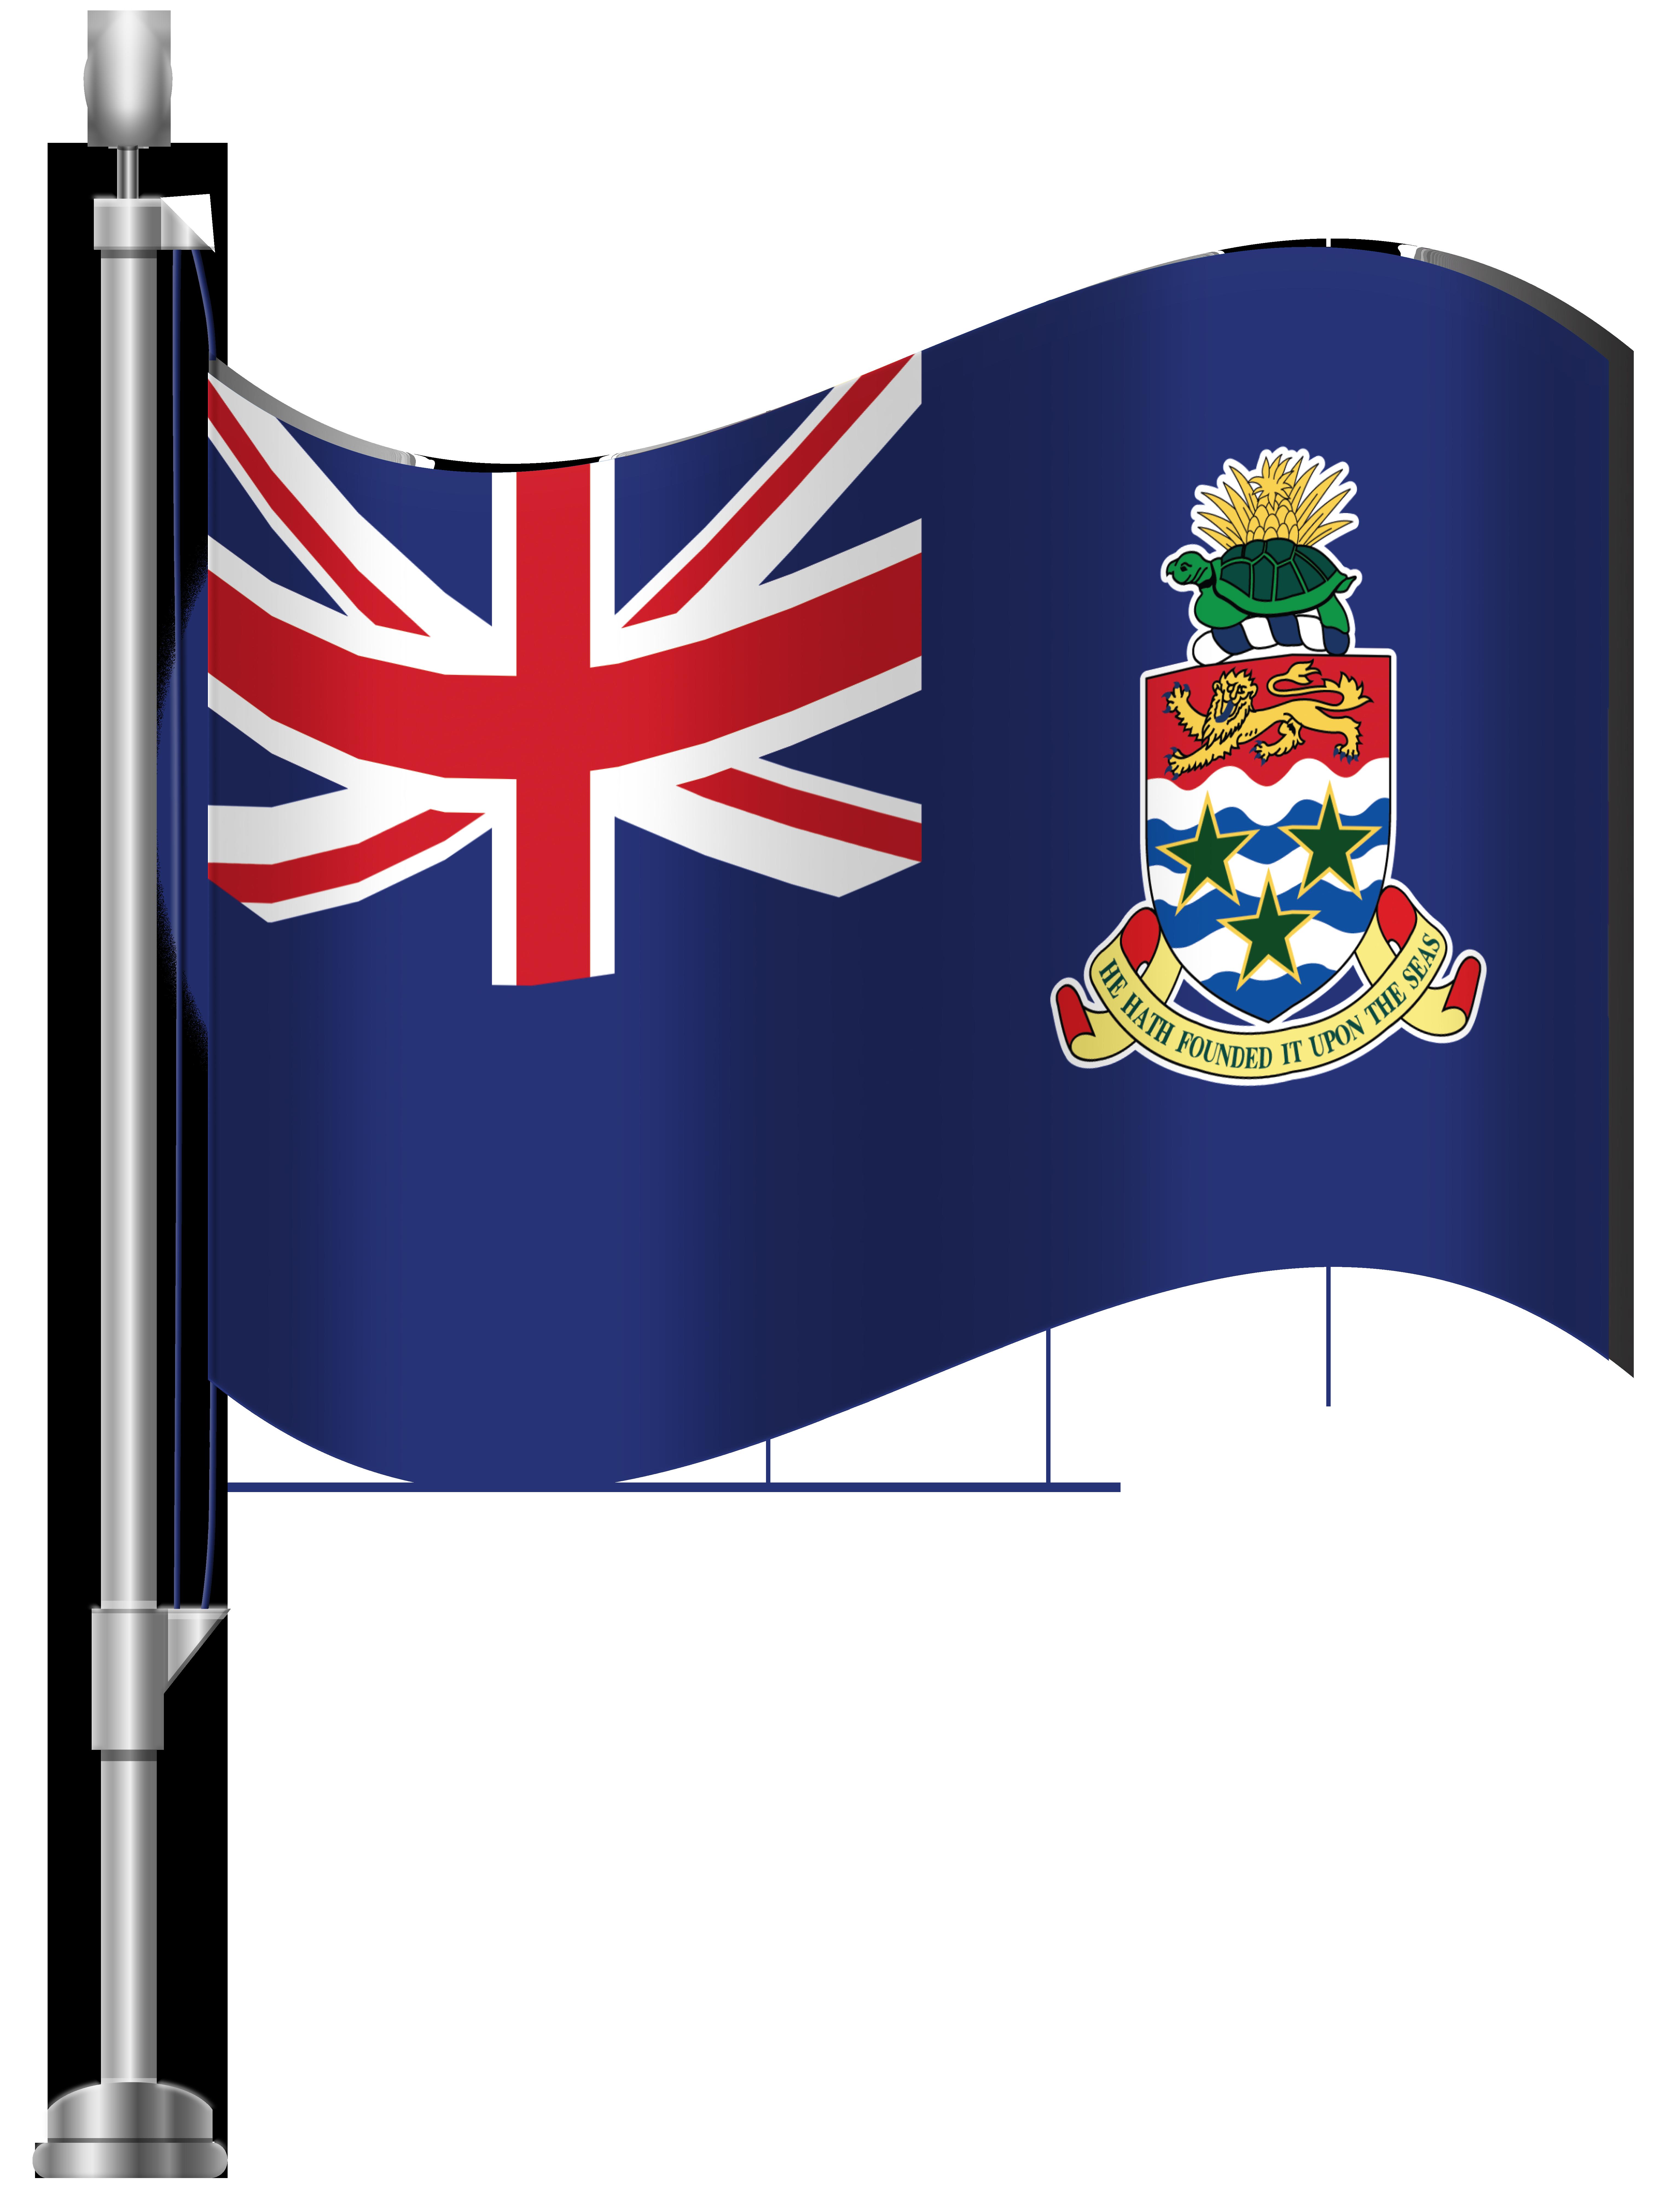 Australia clipart high quality. Cayman islands flag png